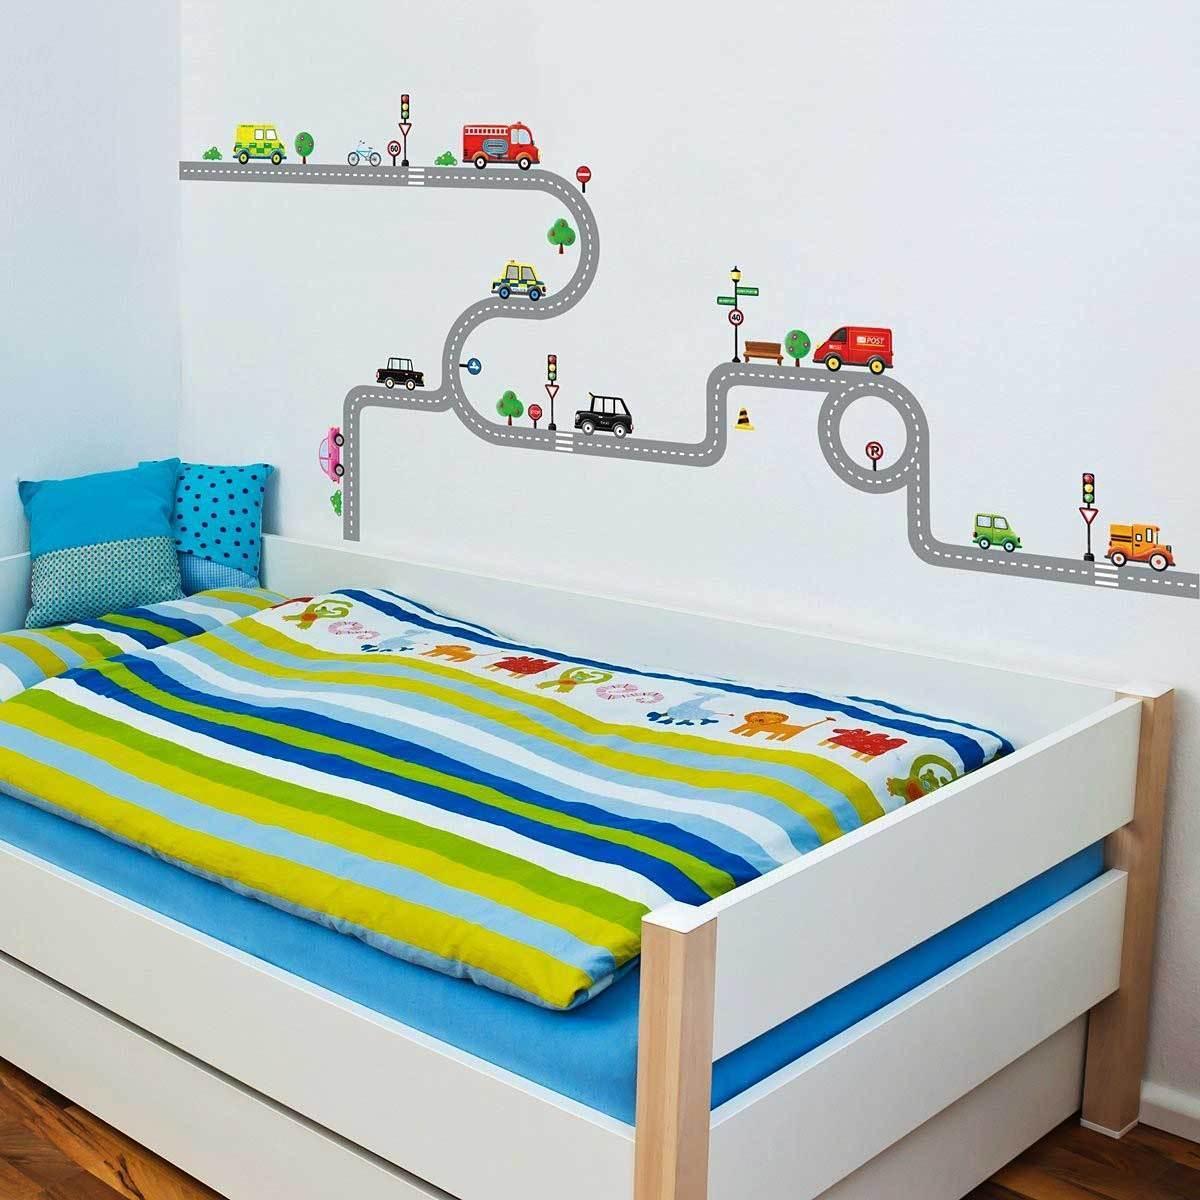 wandsticker wandpuzzle wandtattoo autobahn stra en autos kinderzimmer jungen eur 24 99. Black Bedroom Furniture Sets. Home Design Ideas